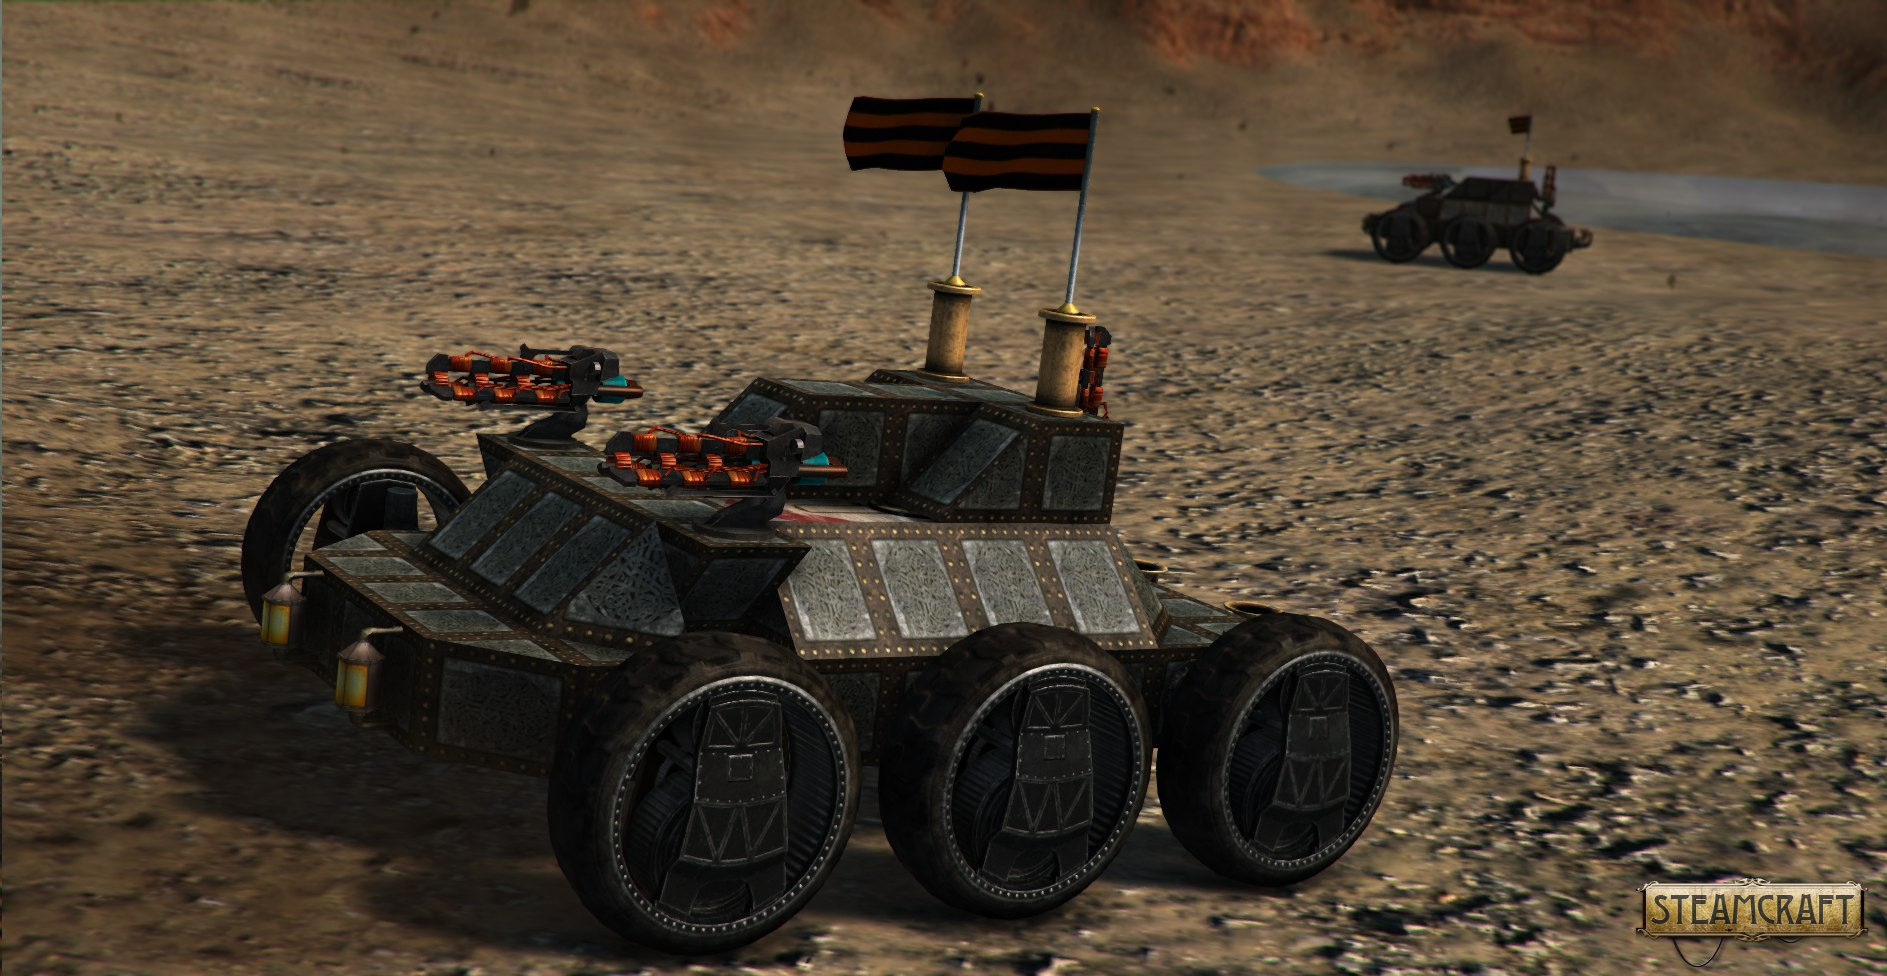 Steamcraft Steampunk Multiplayer Shooter With Steam Powered Vehicles Pc Steam Greenlight Unity Forum